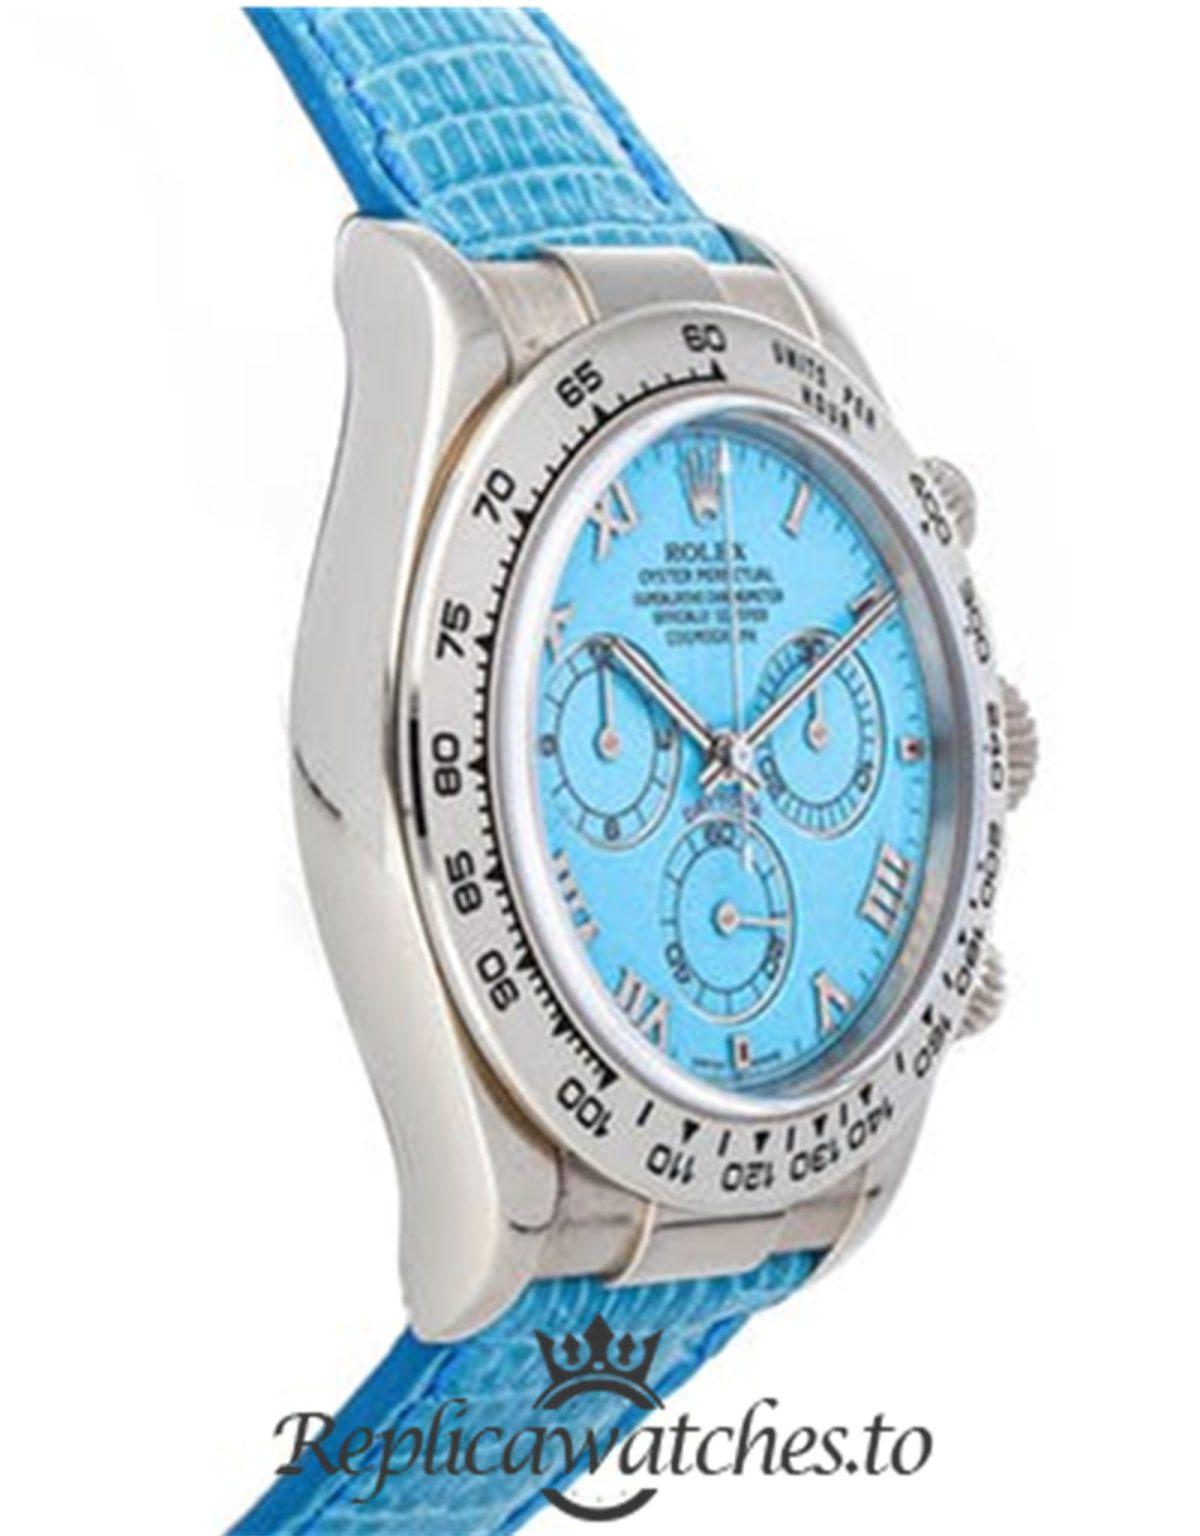 Rolex Daytona Replica 116519 Turquoise Dial 40MM